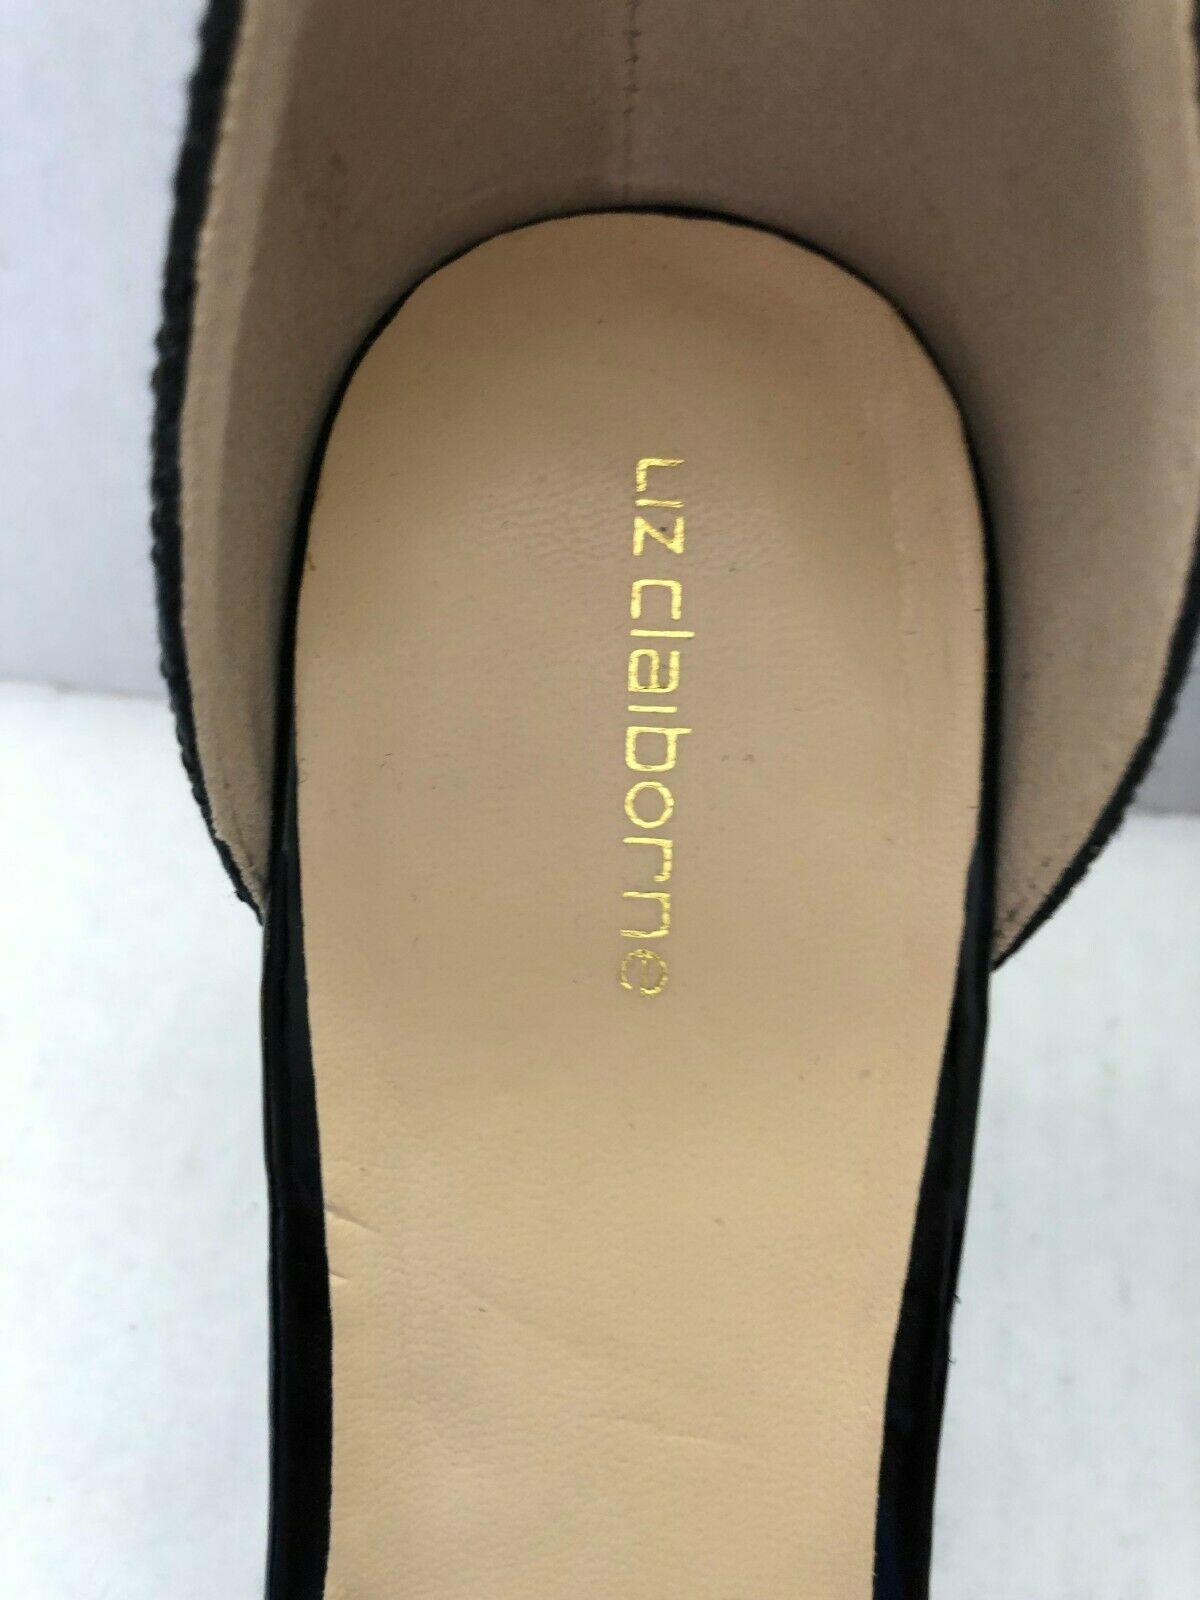 Liz Claiborne Heidy Jeweled Heeled Sandals Black Size 7.5 NWOB